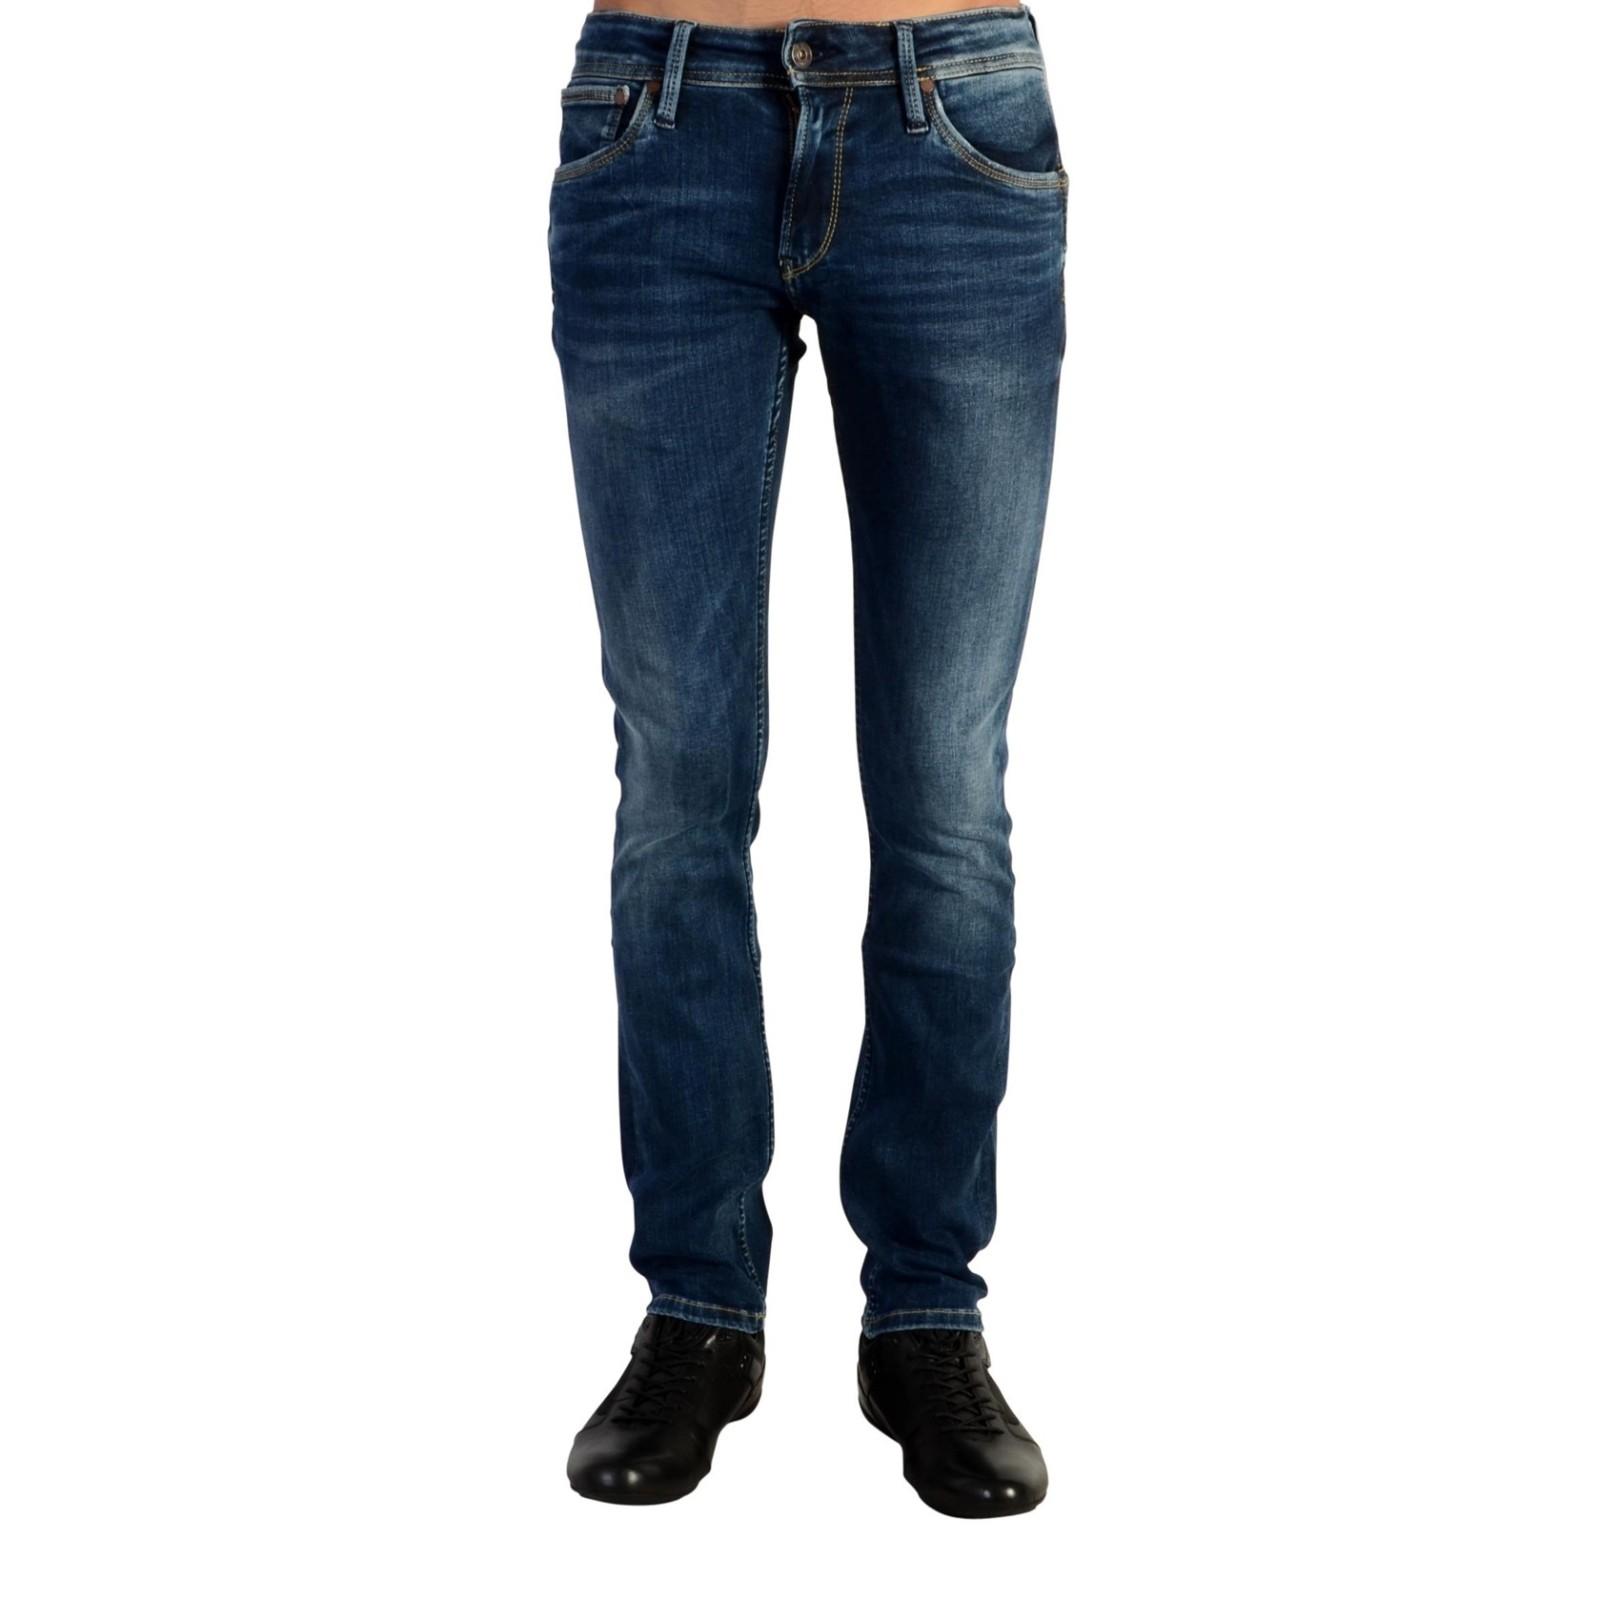 Jeans Pepe Jeans Enfant Cashed PB200231T48 Denim